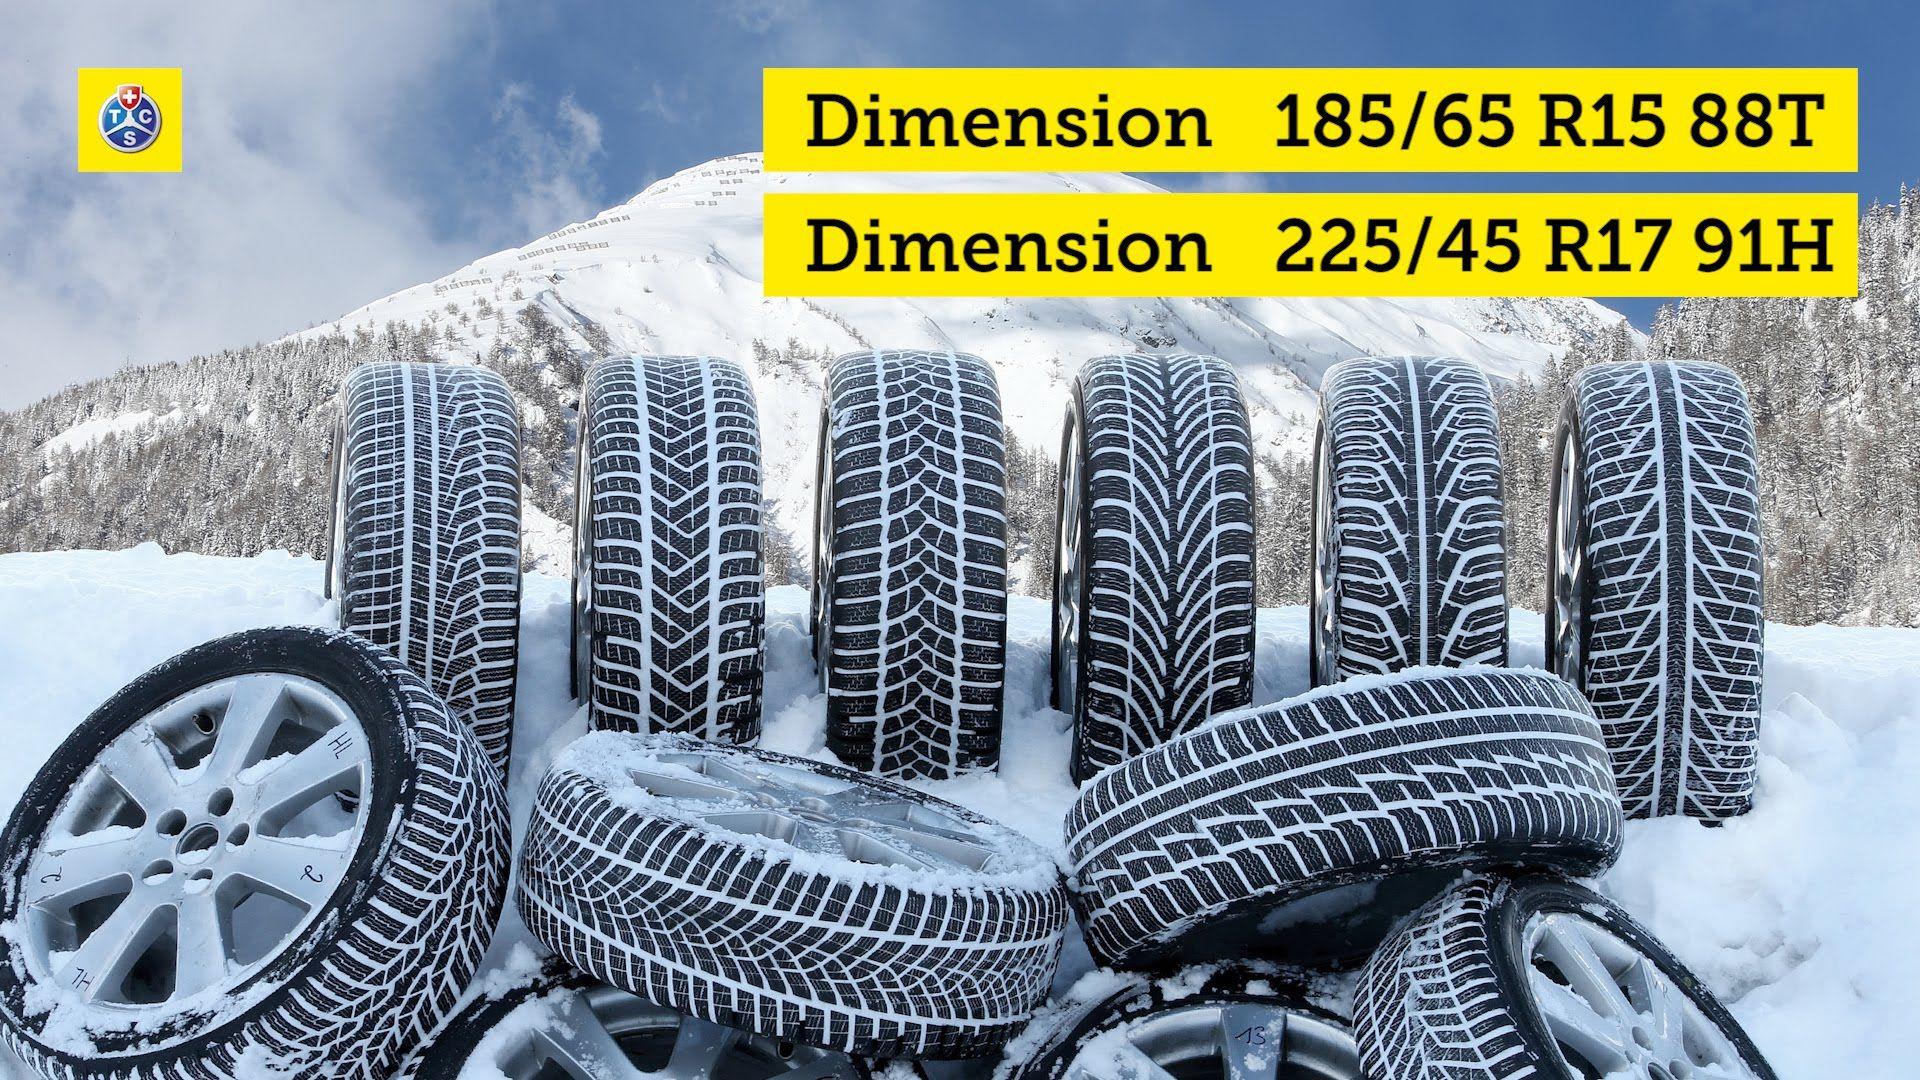 pneu hiver test comparatifs 2017 tests comparatifs pneus pinterest pneu pneu 4x4 et suv. Black Bedroom Furniture Sets. Home Design Ideas